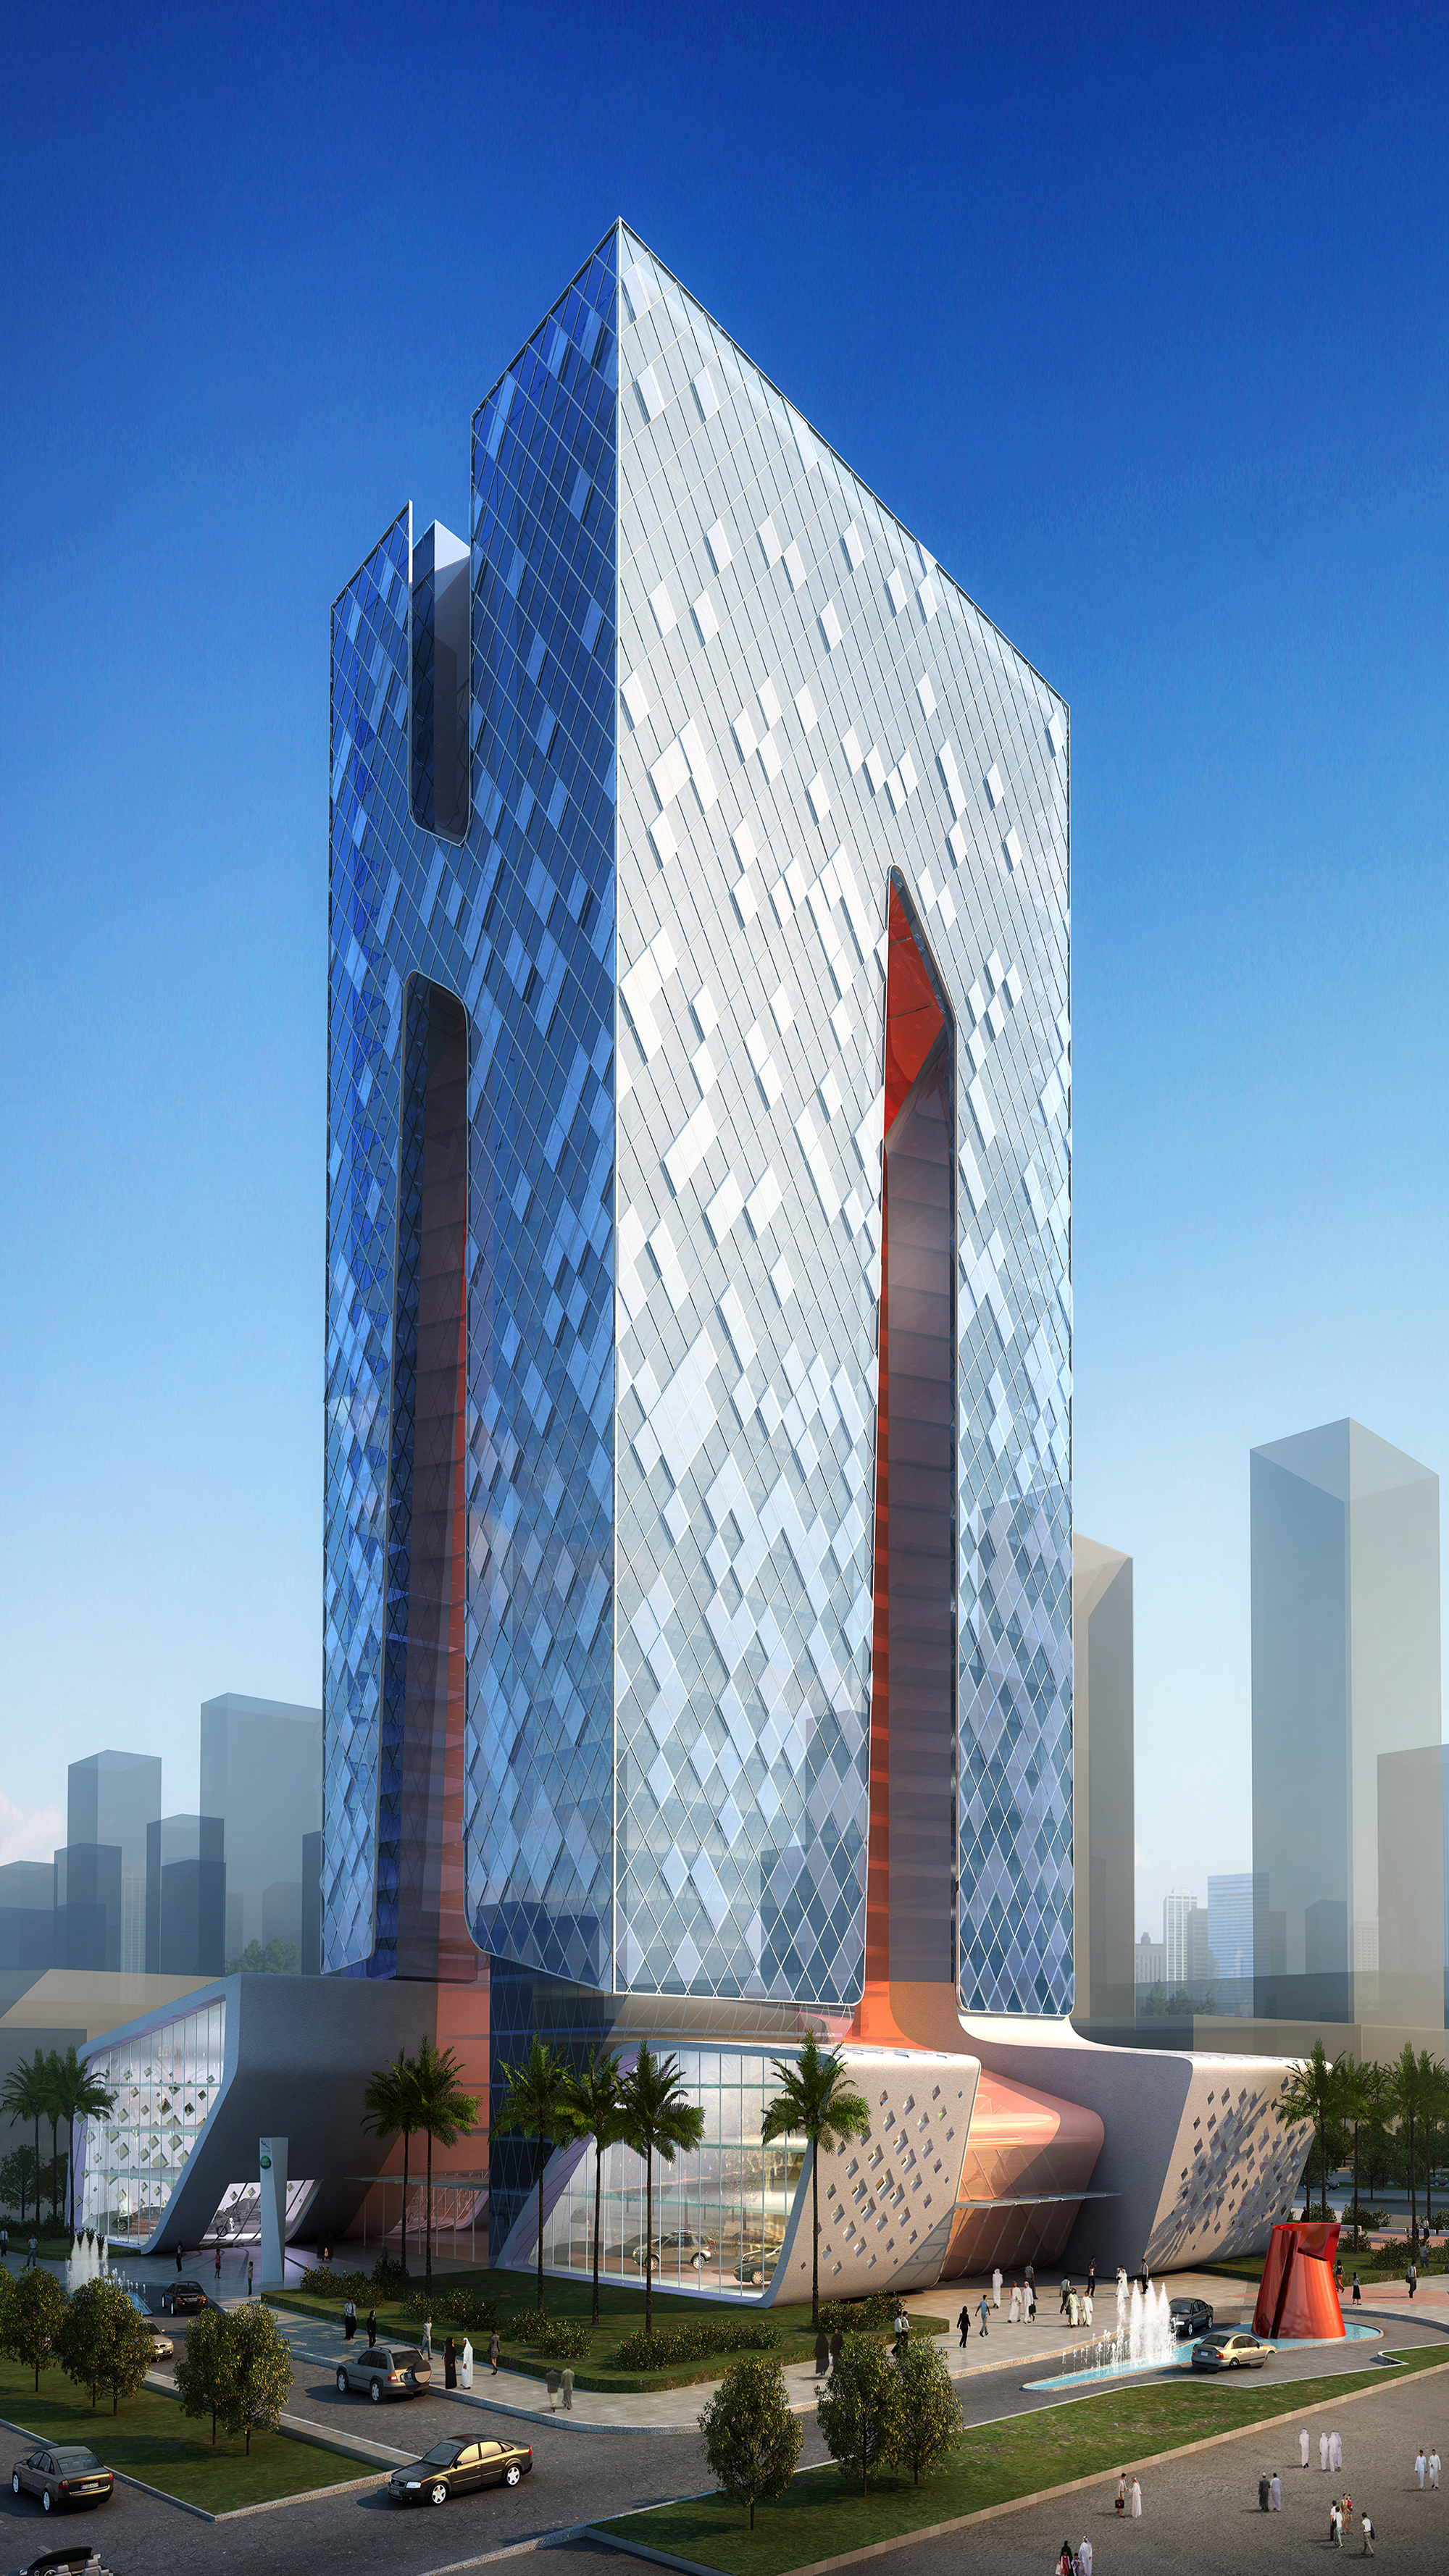 lusail tower BEAD doha Qatar day view2.JPG